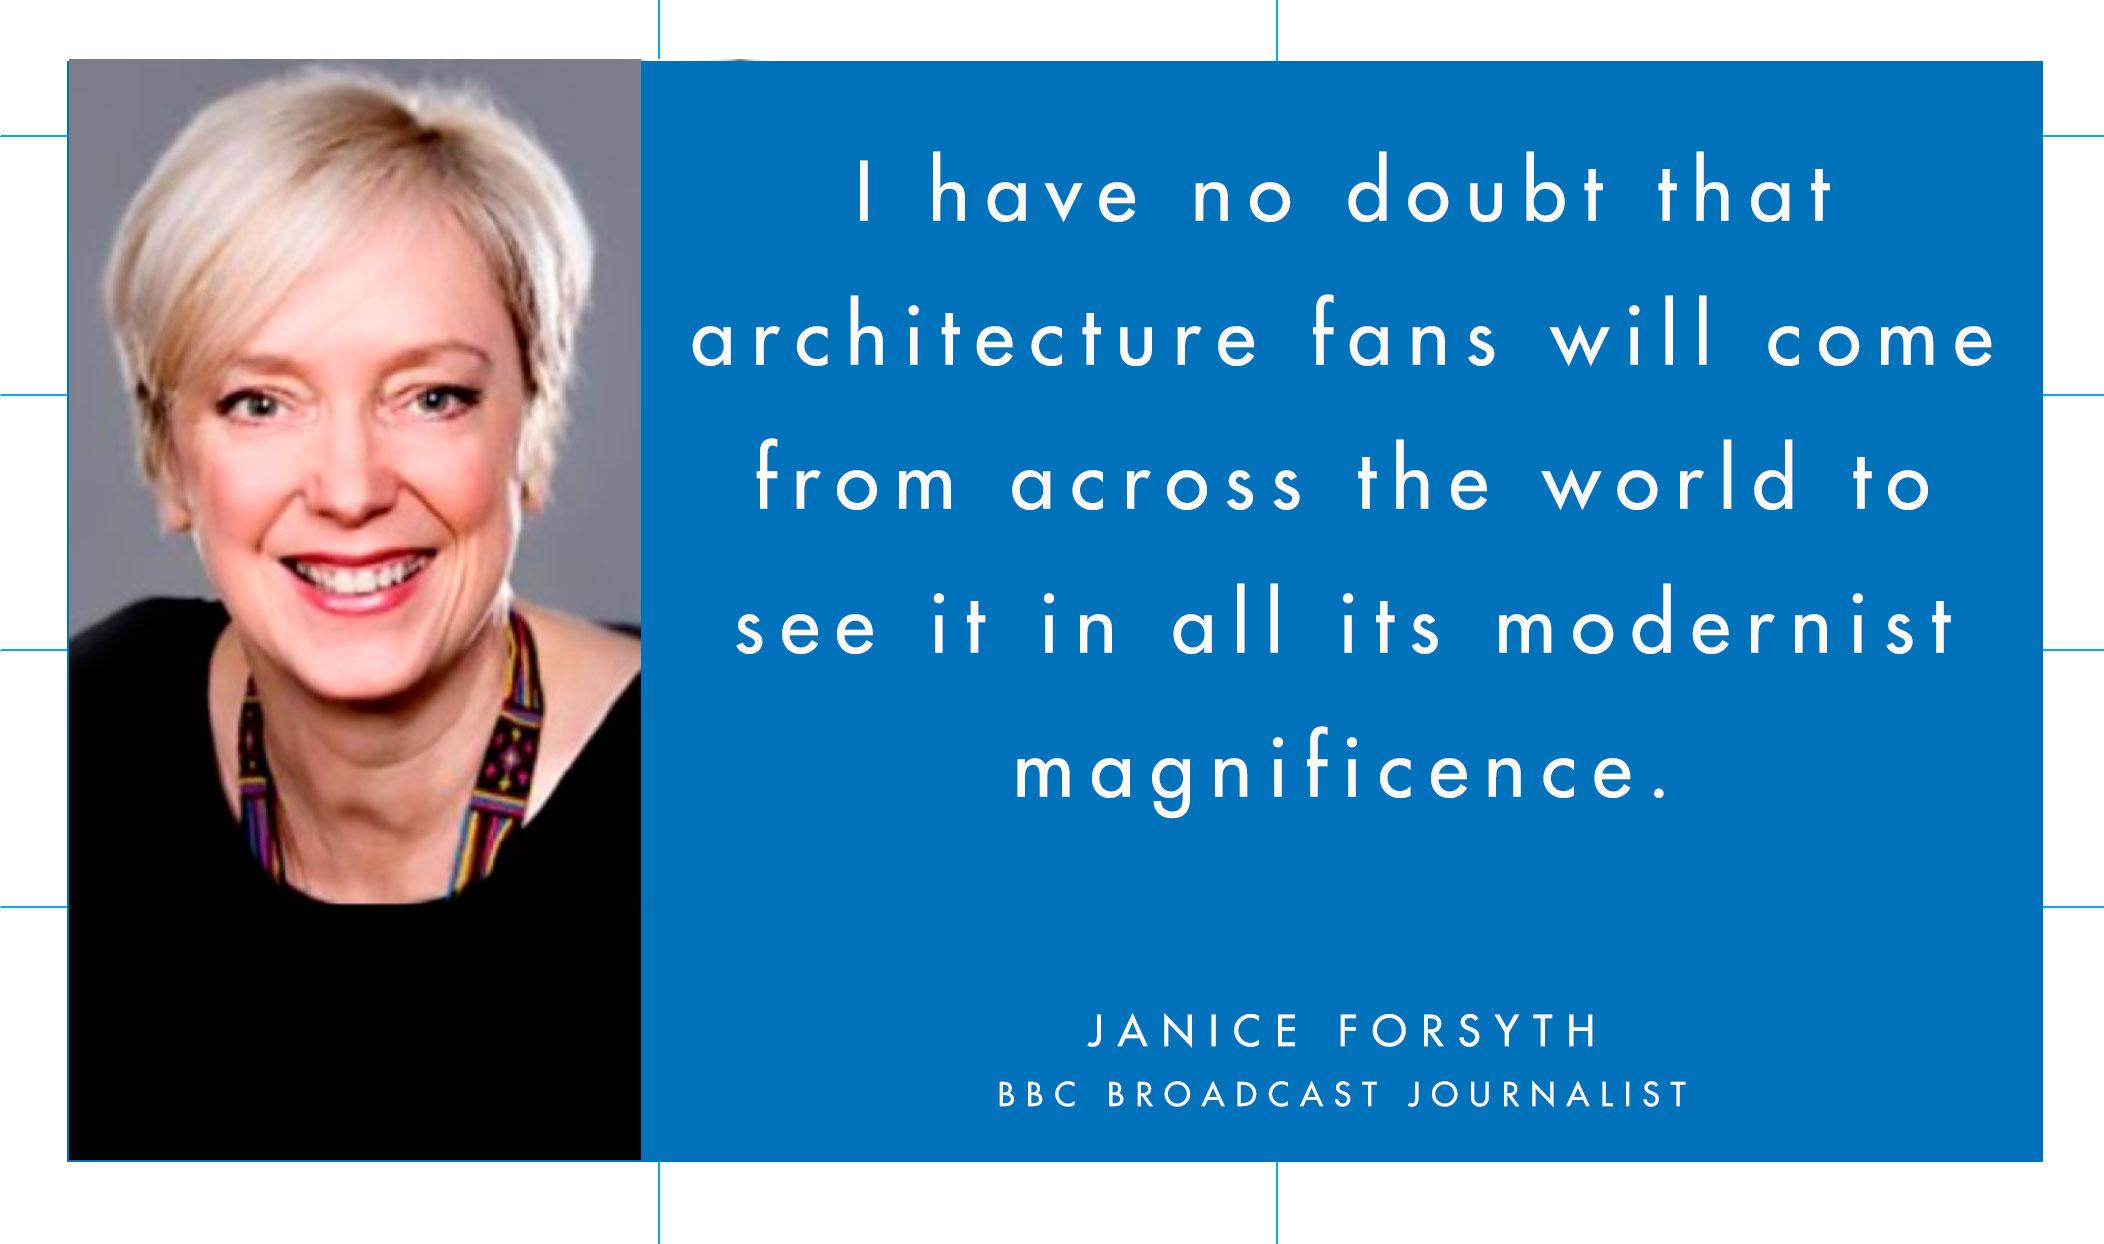 JANICE-FORSYTH-2